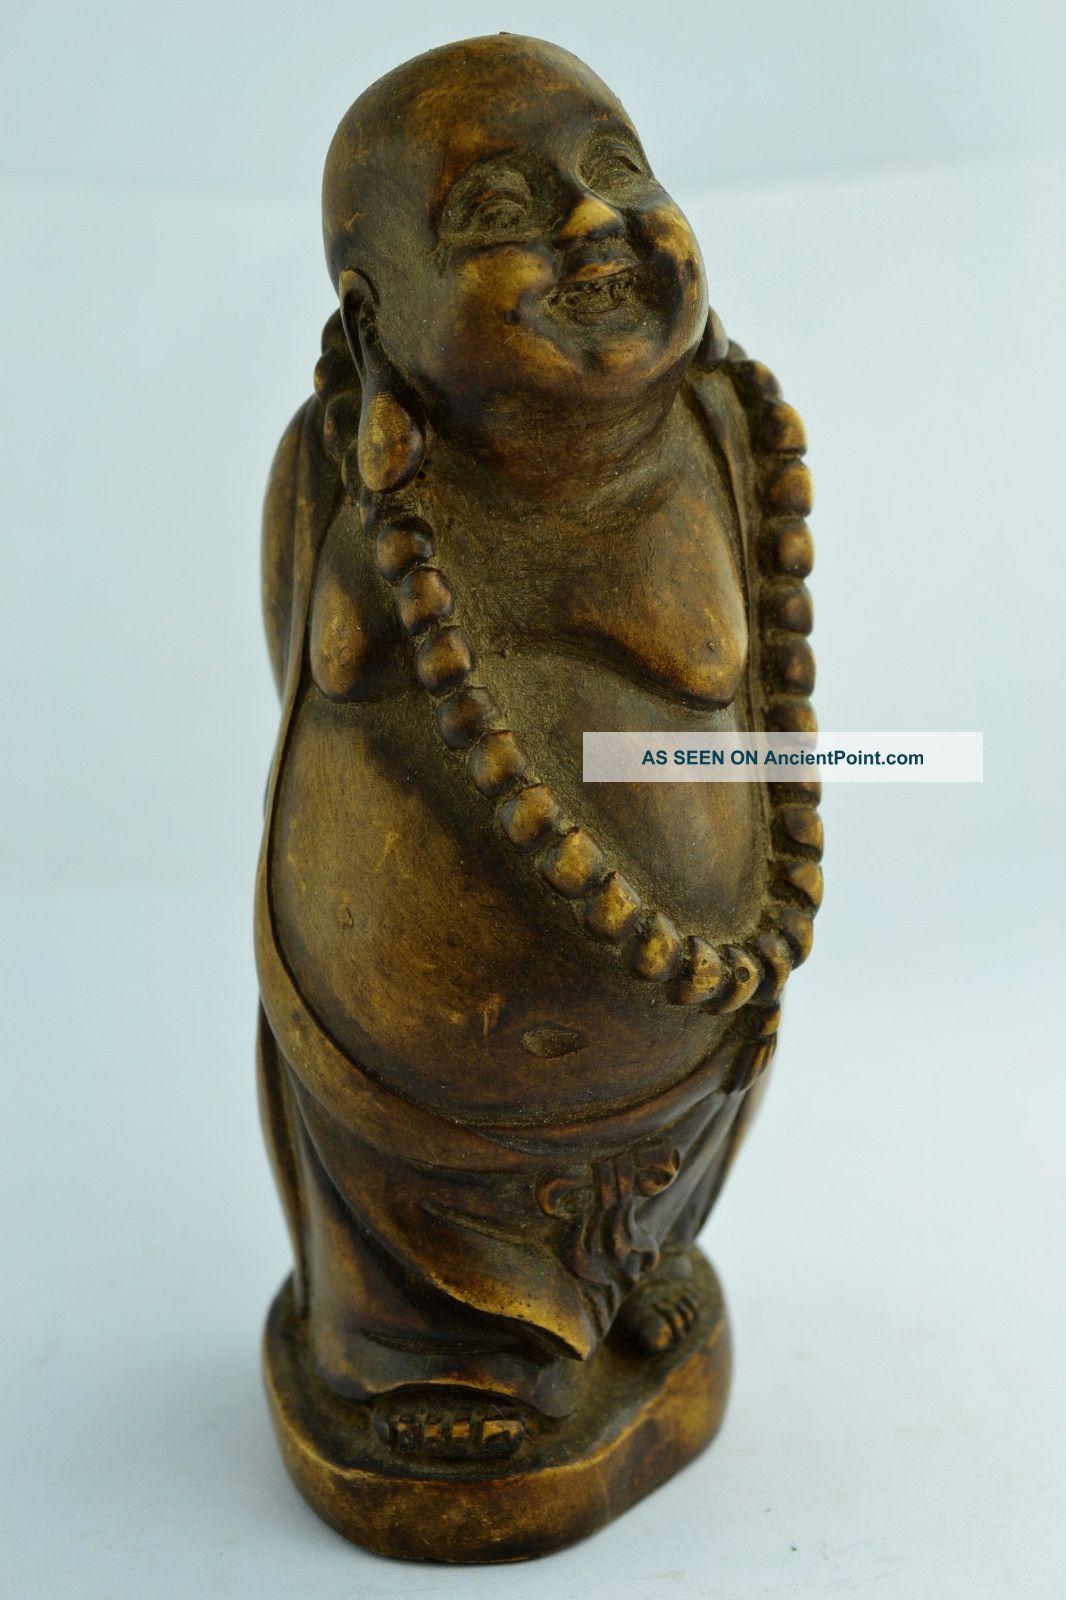 China Collectibles Old Decorated Handwork Alabaster Buddha Exorcism Statue Buddha photo